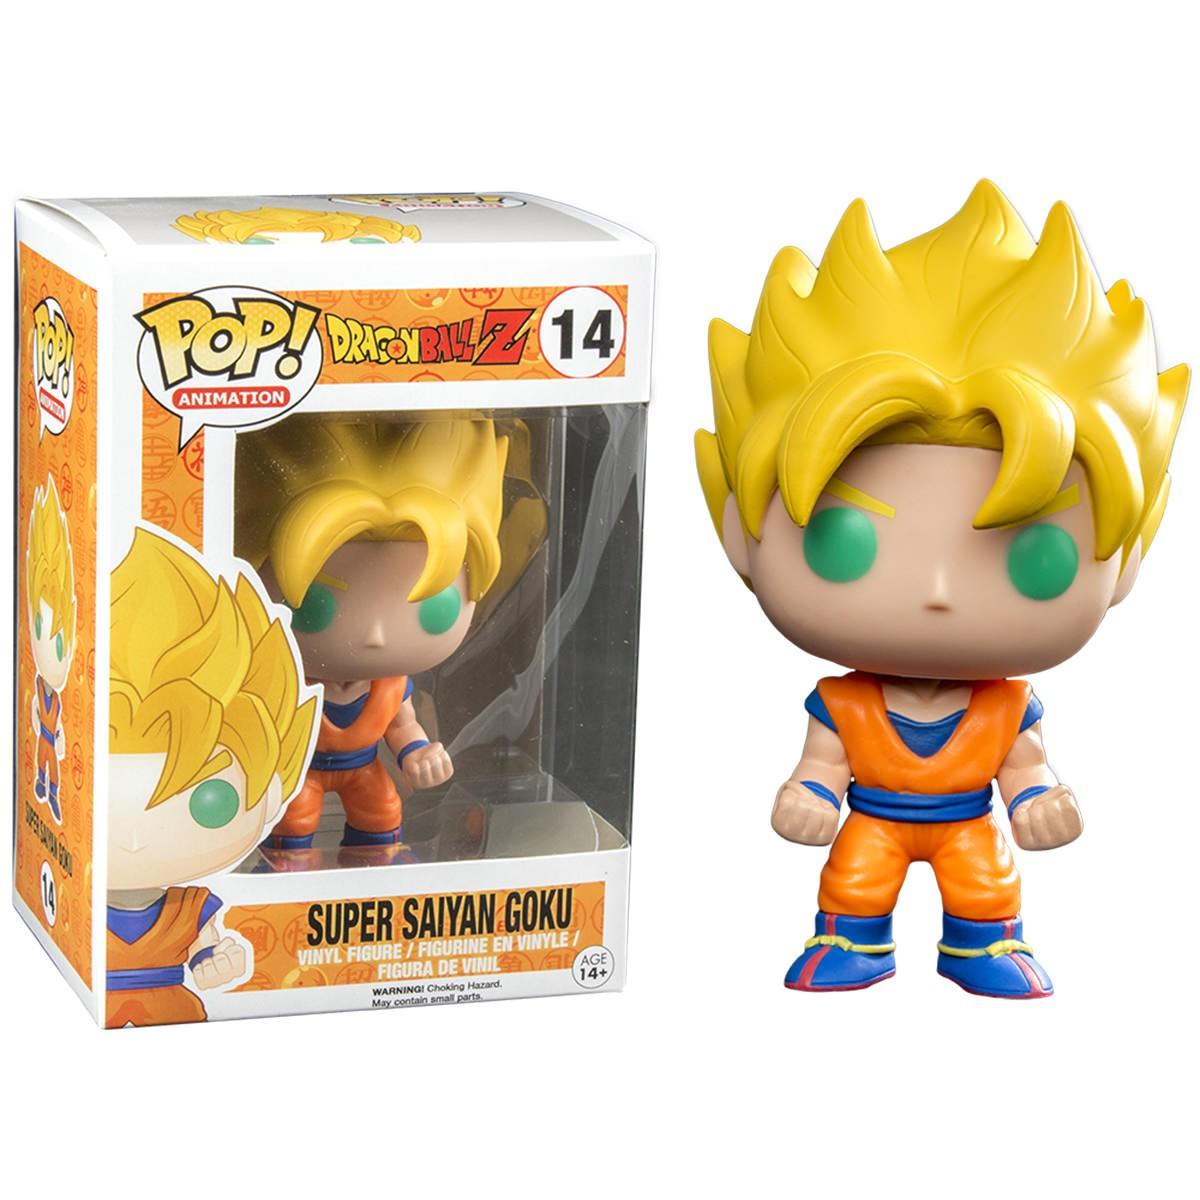 Dragonball Z - Super Saiyan Goku Funko Pop!